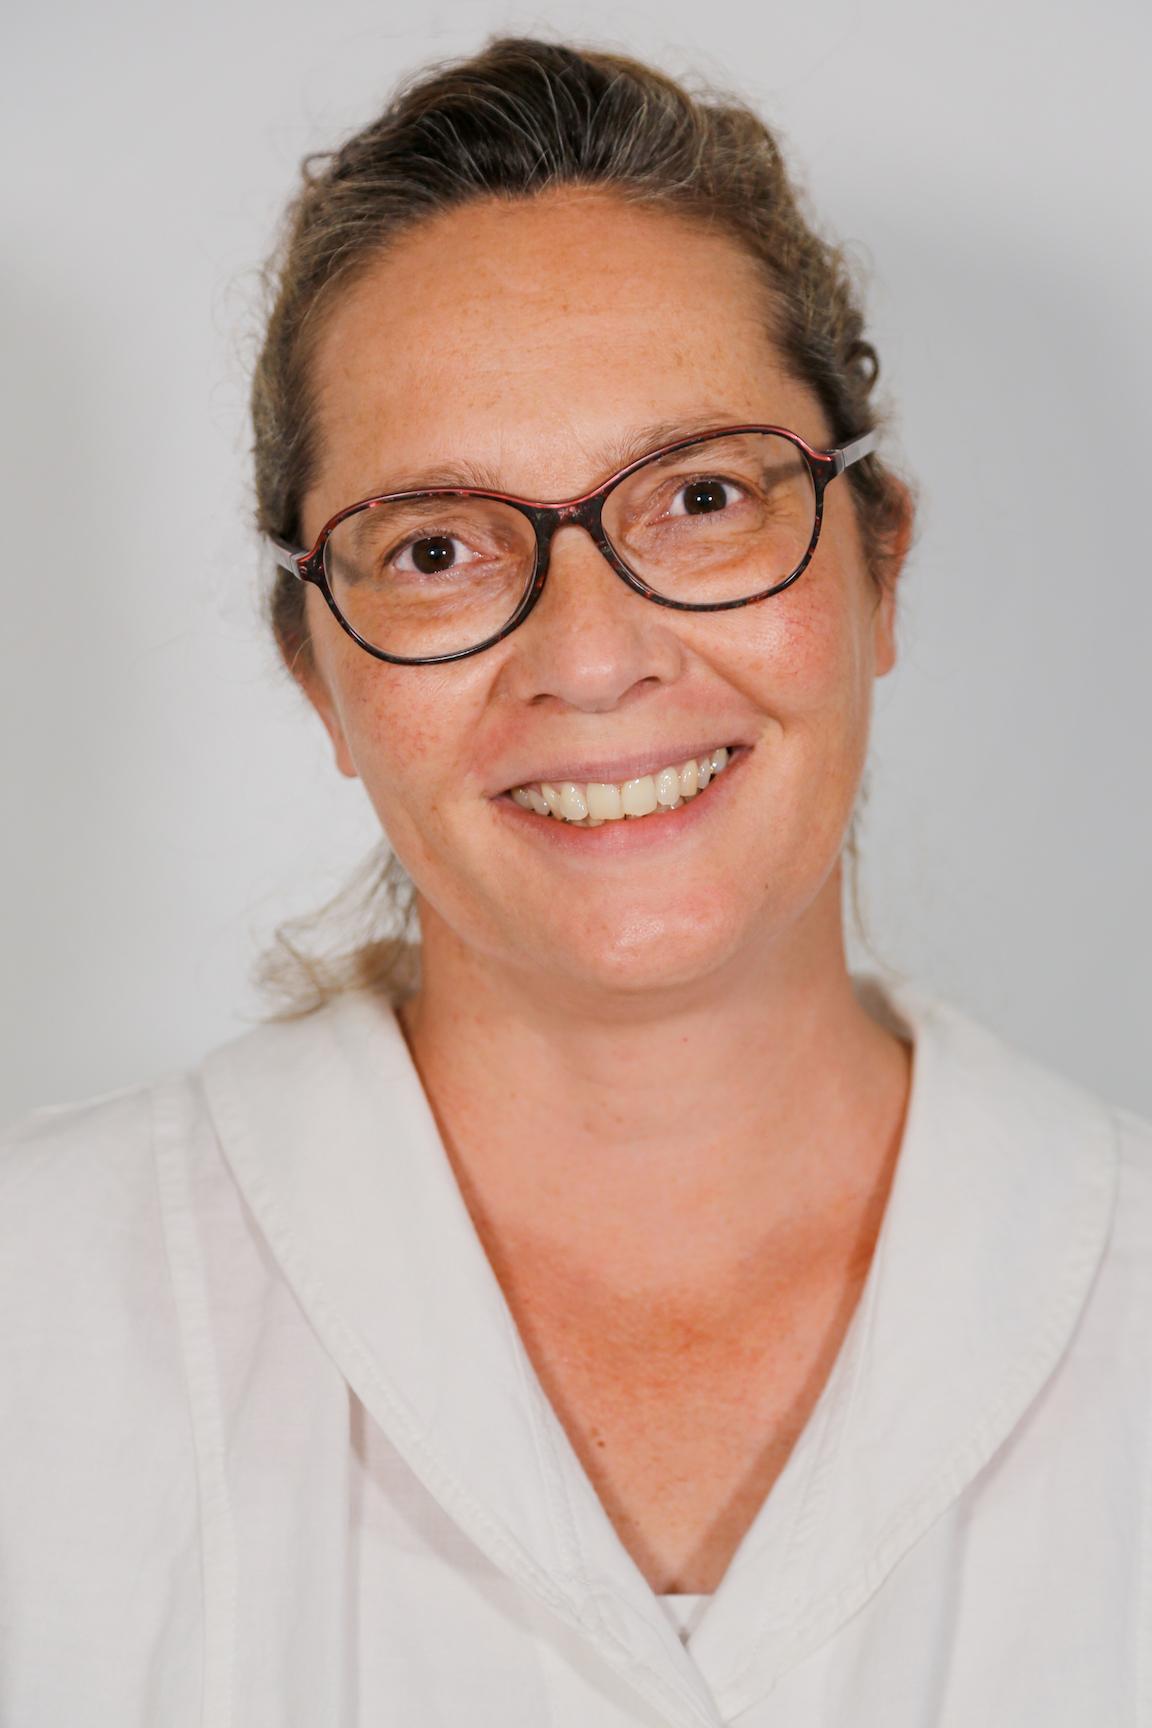 Frau Bianca Eulberg